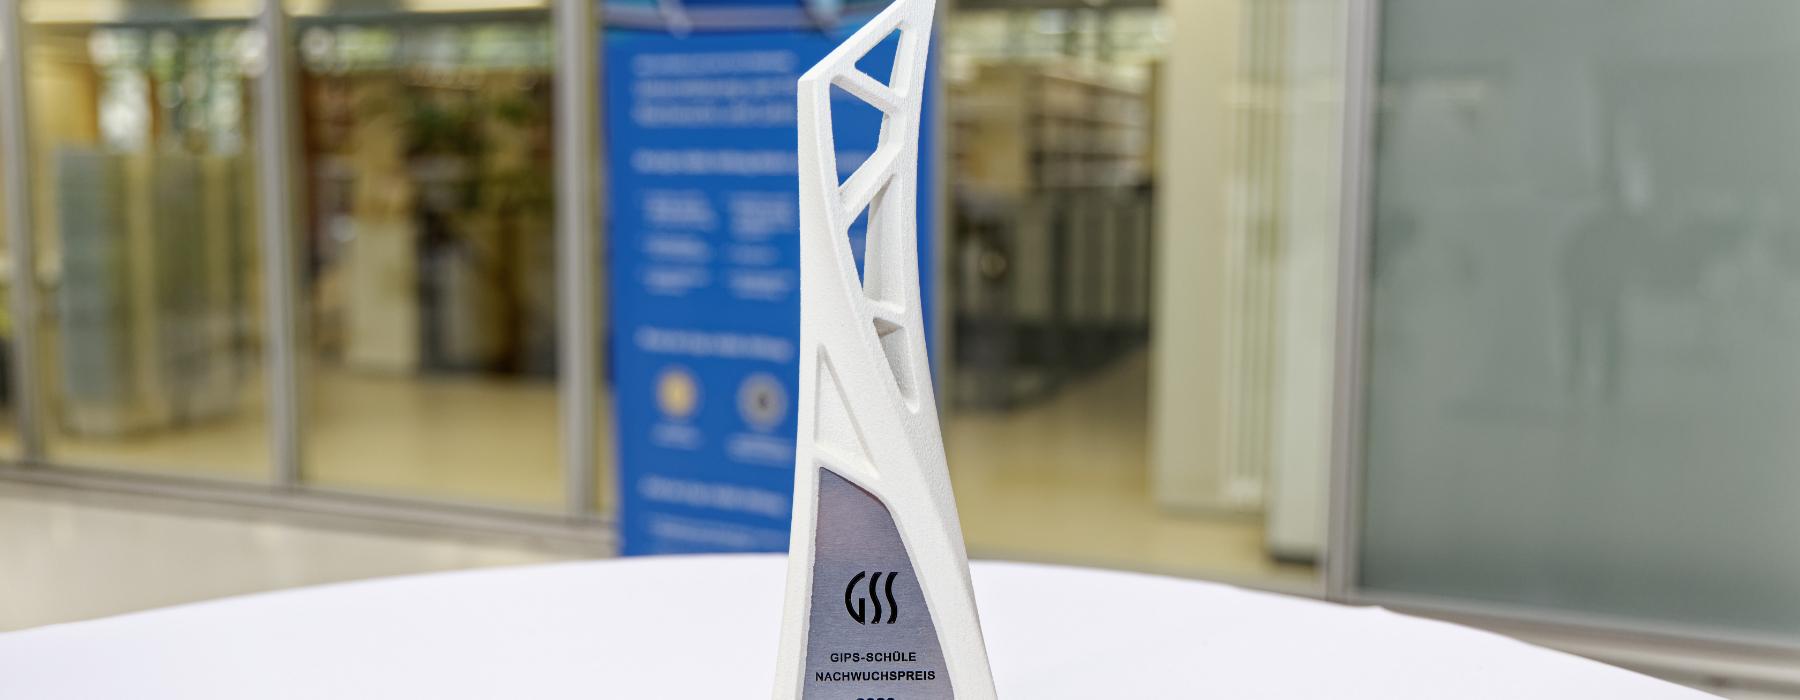 Gips-Schüle-Nachwuchspreis Award 2020